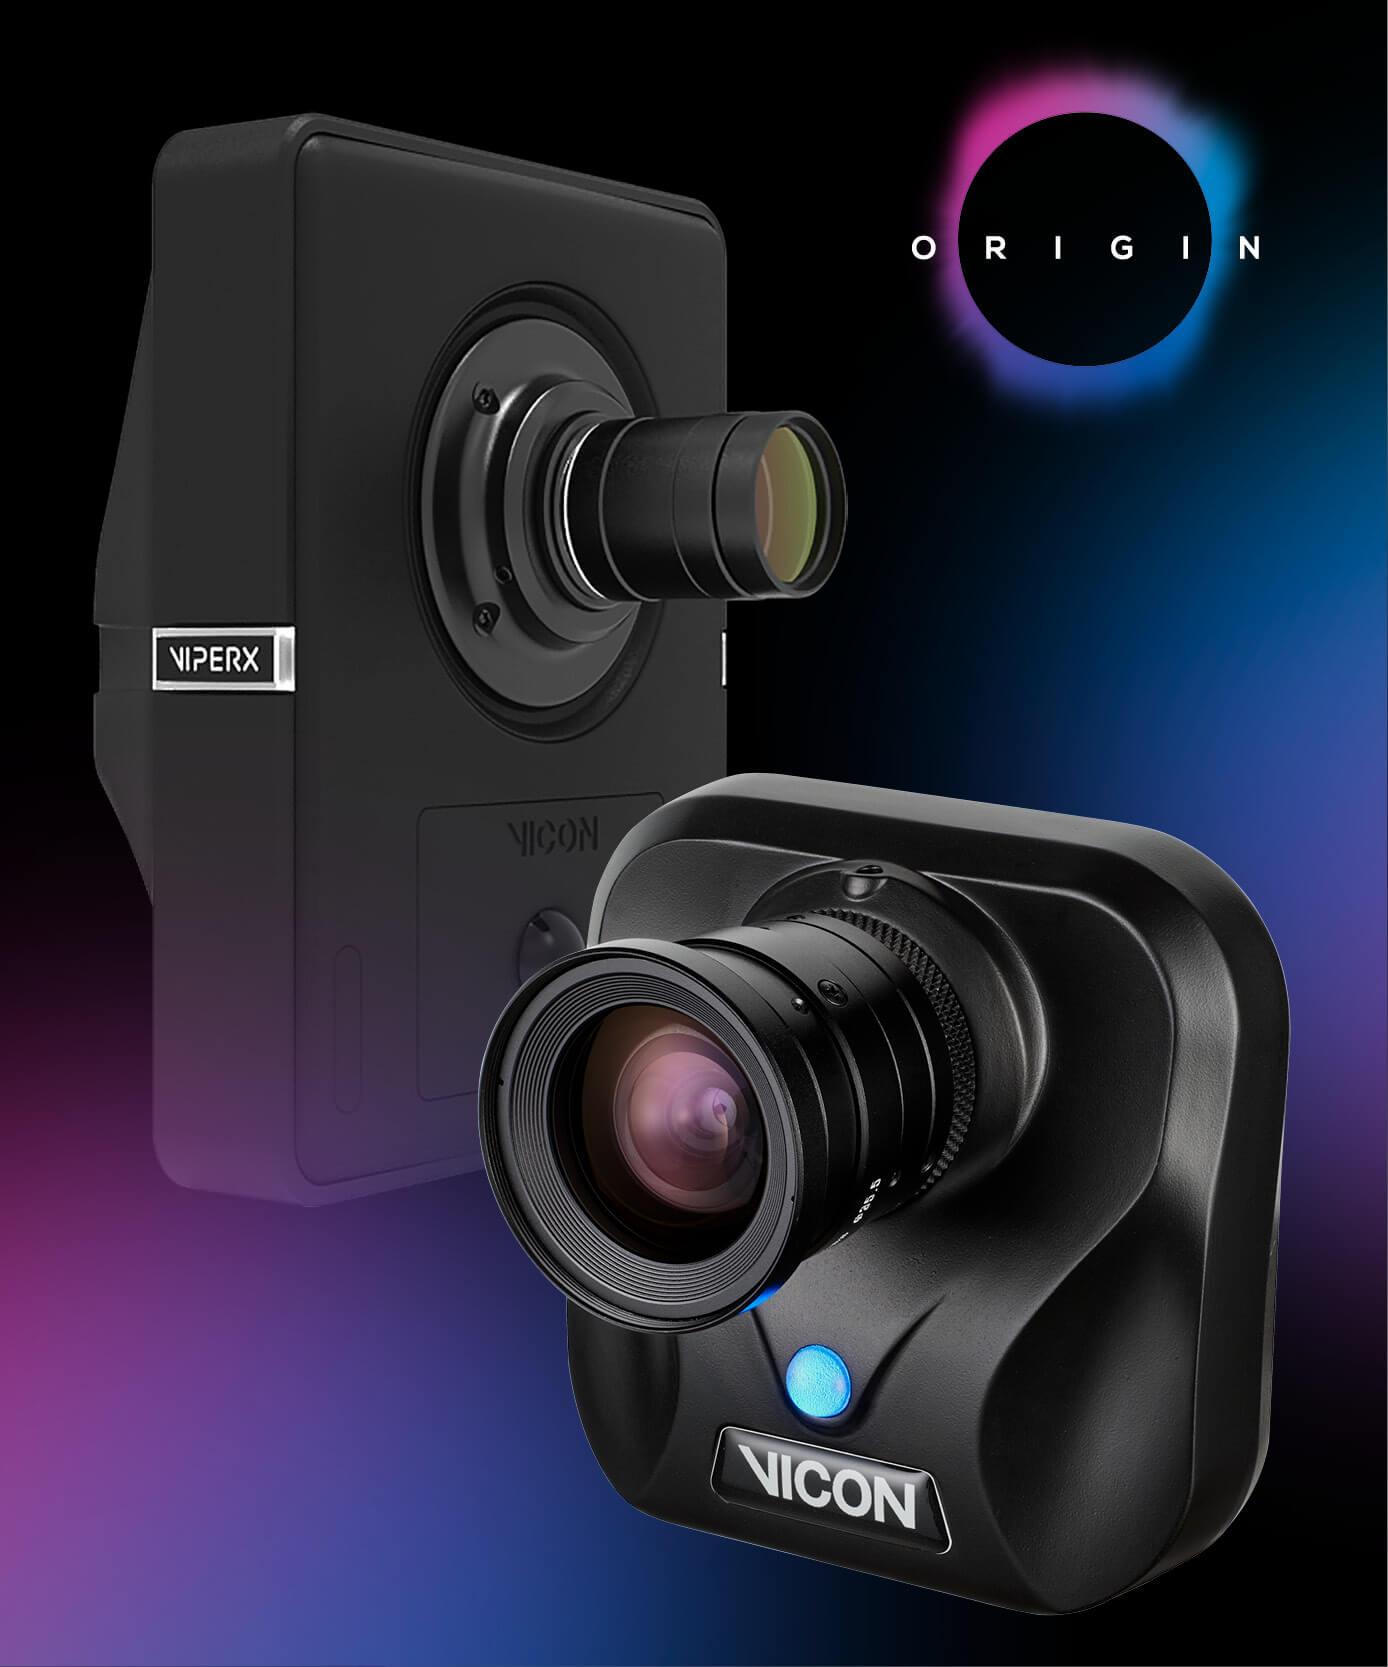 Viper and ViperX cameras